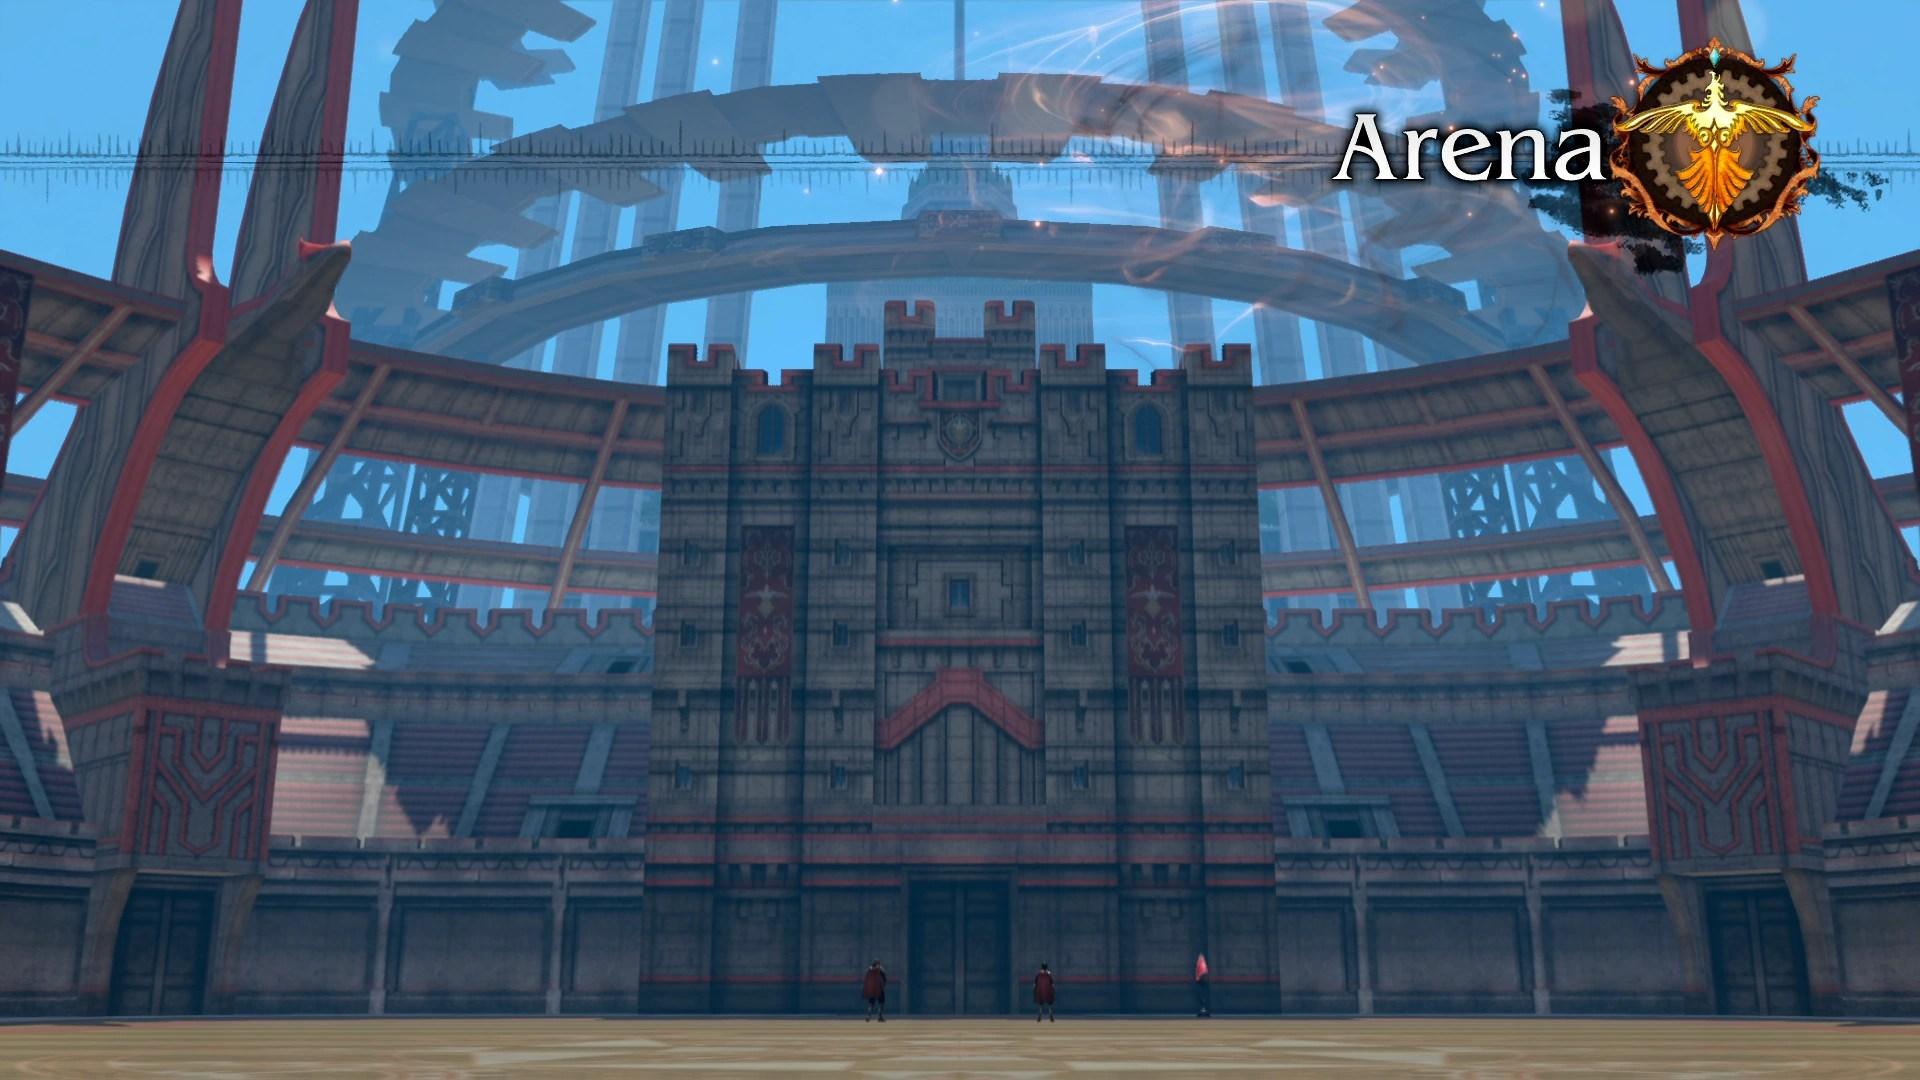 Monster University Wallpaper Hd Arena Final Fantasy Wiki Fandom Powered By Wikia